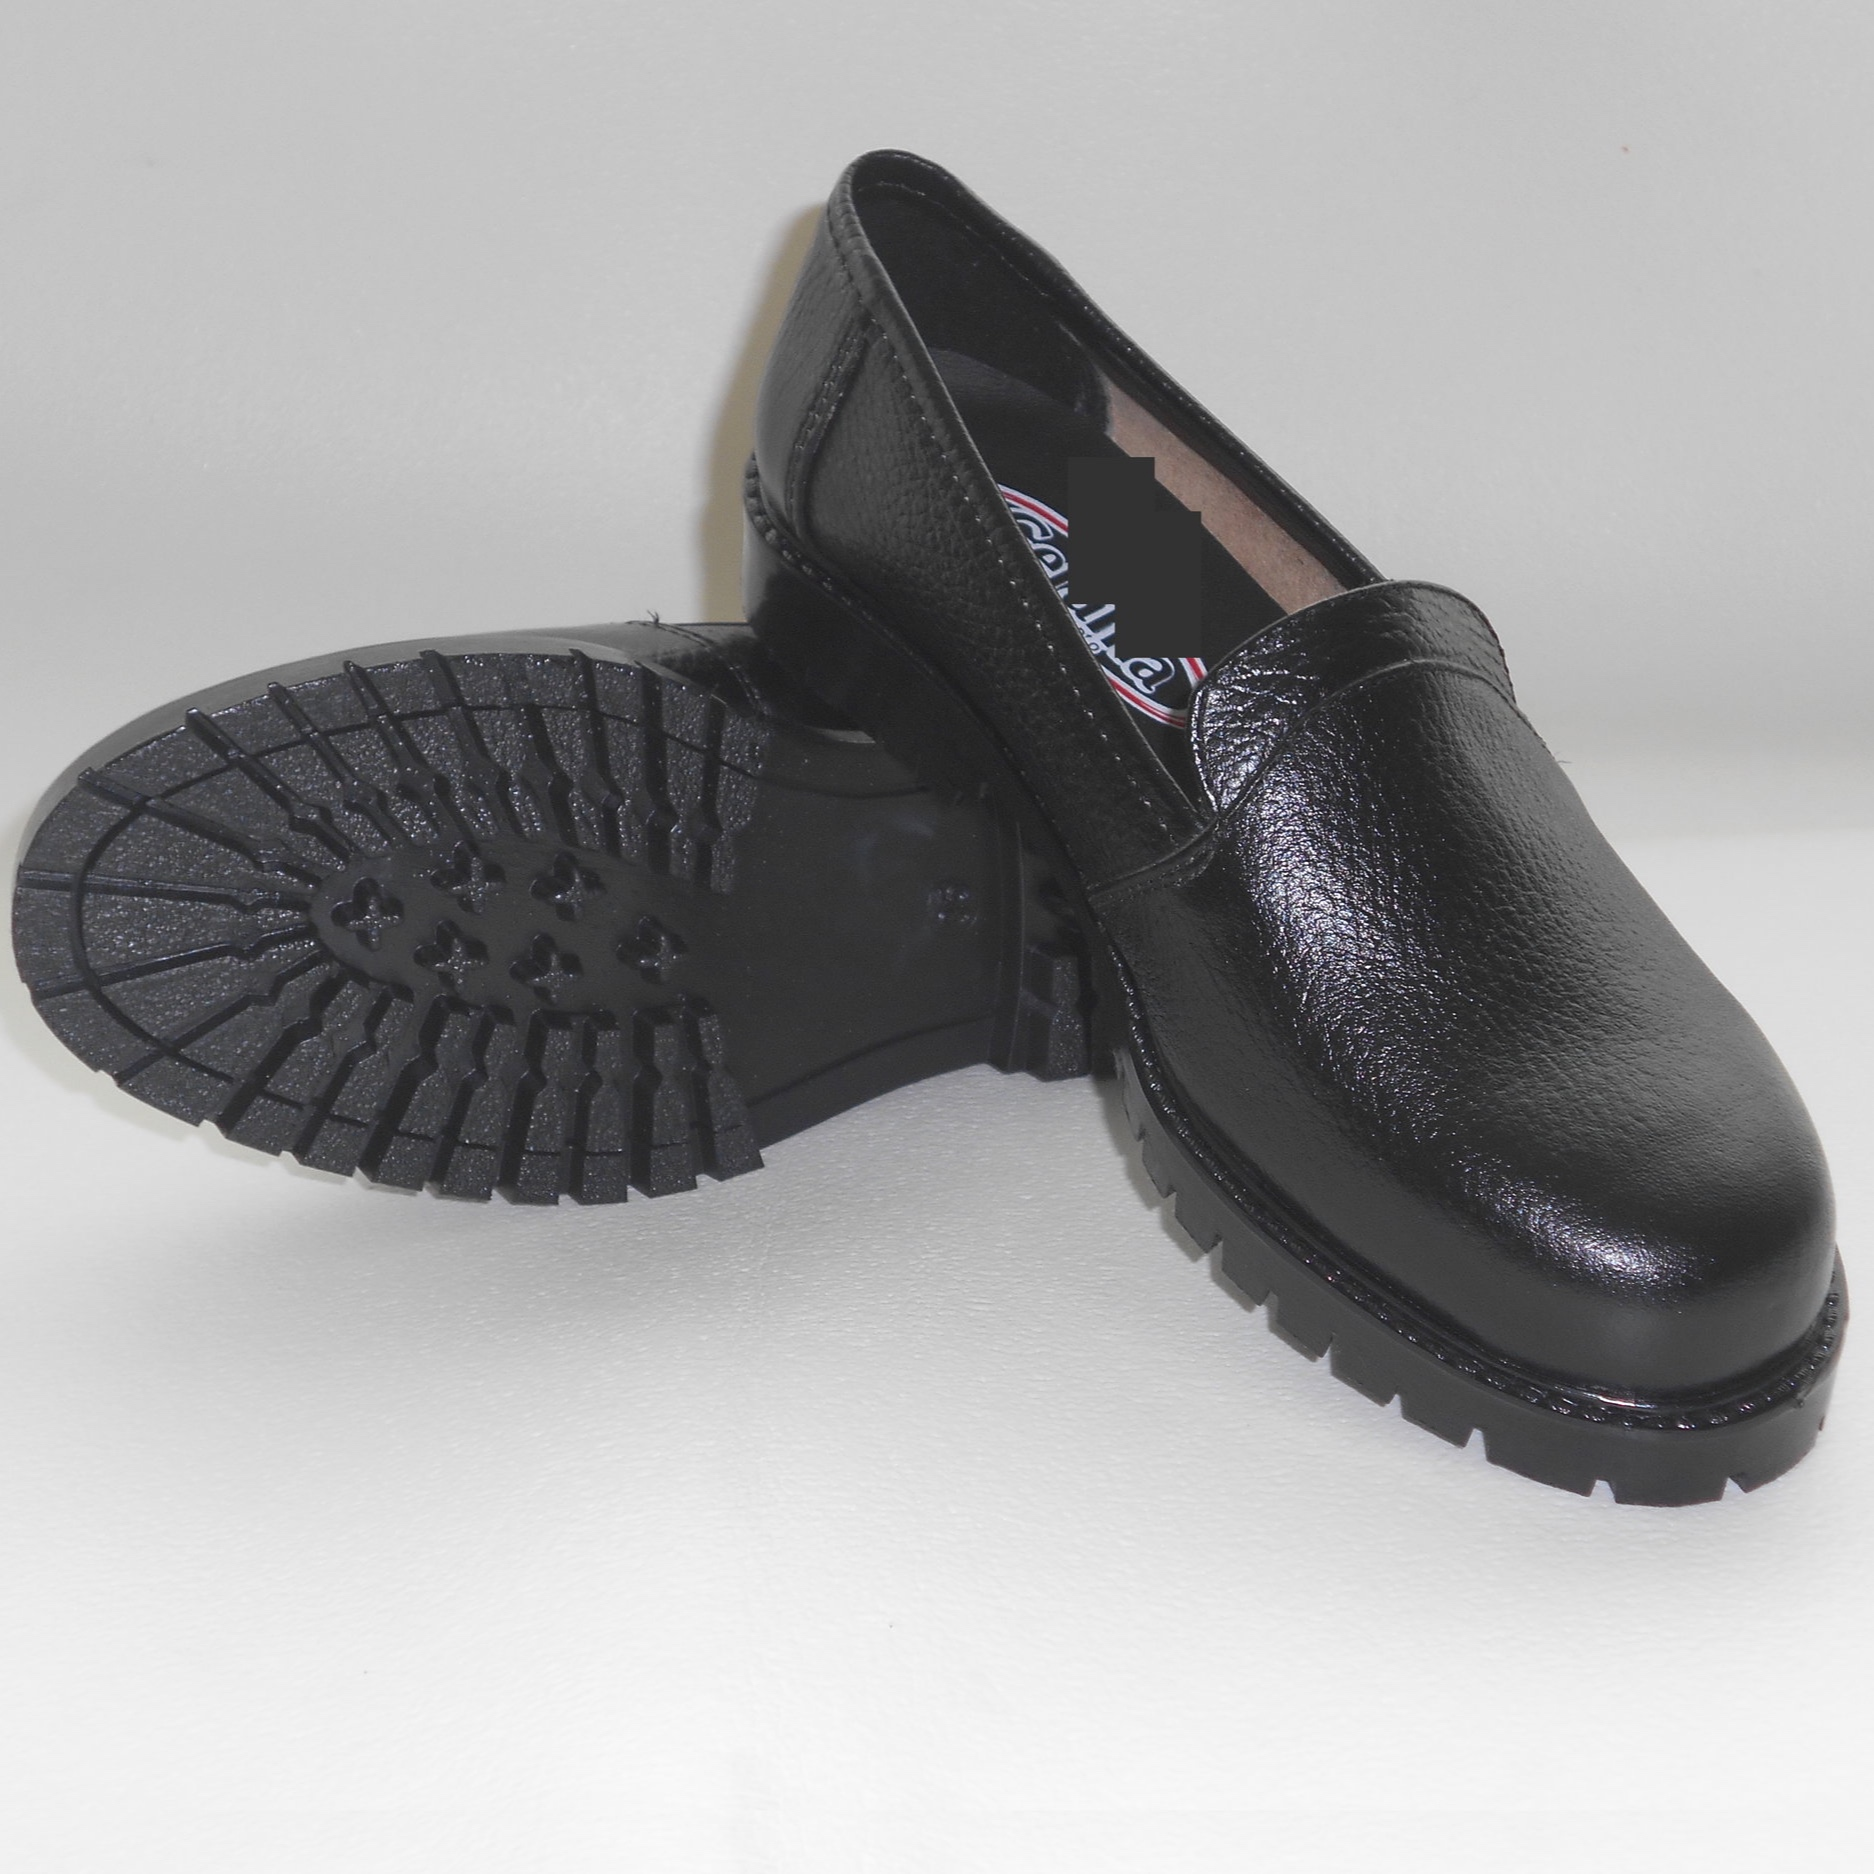 Calzado Suela Antideslizante